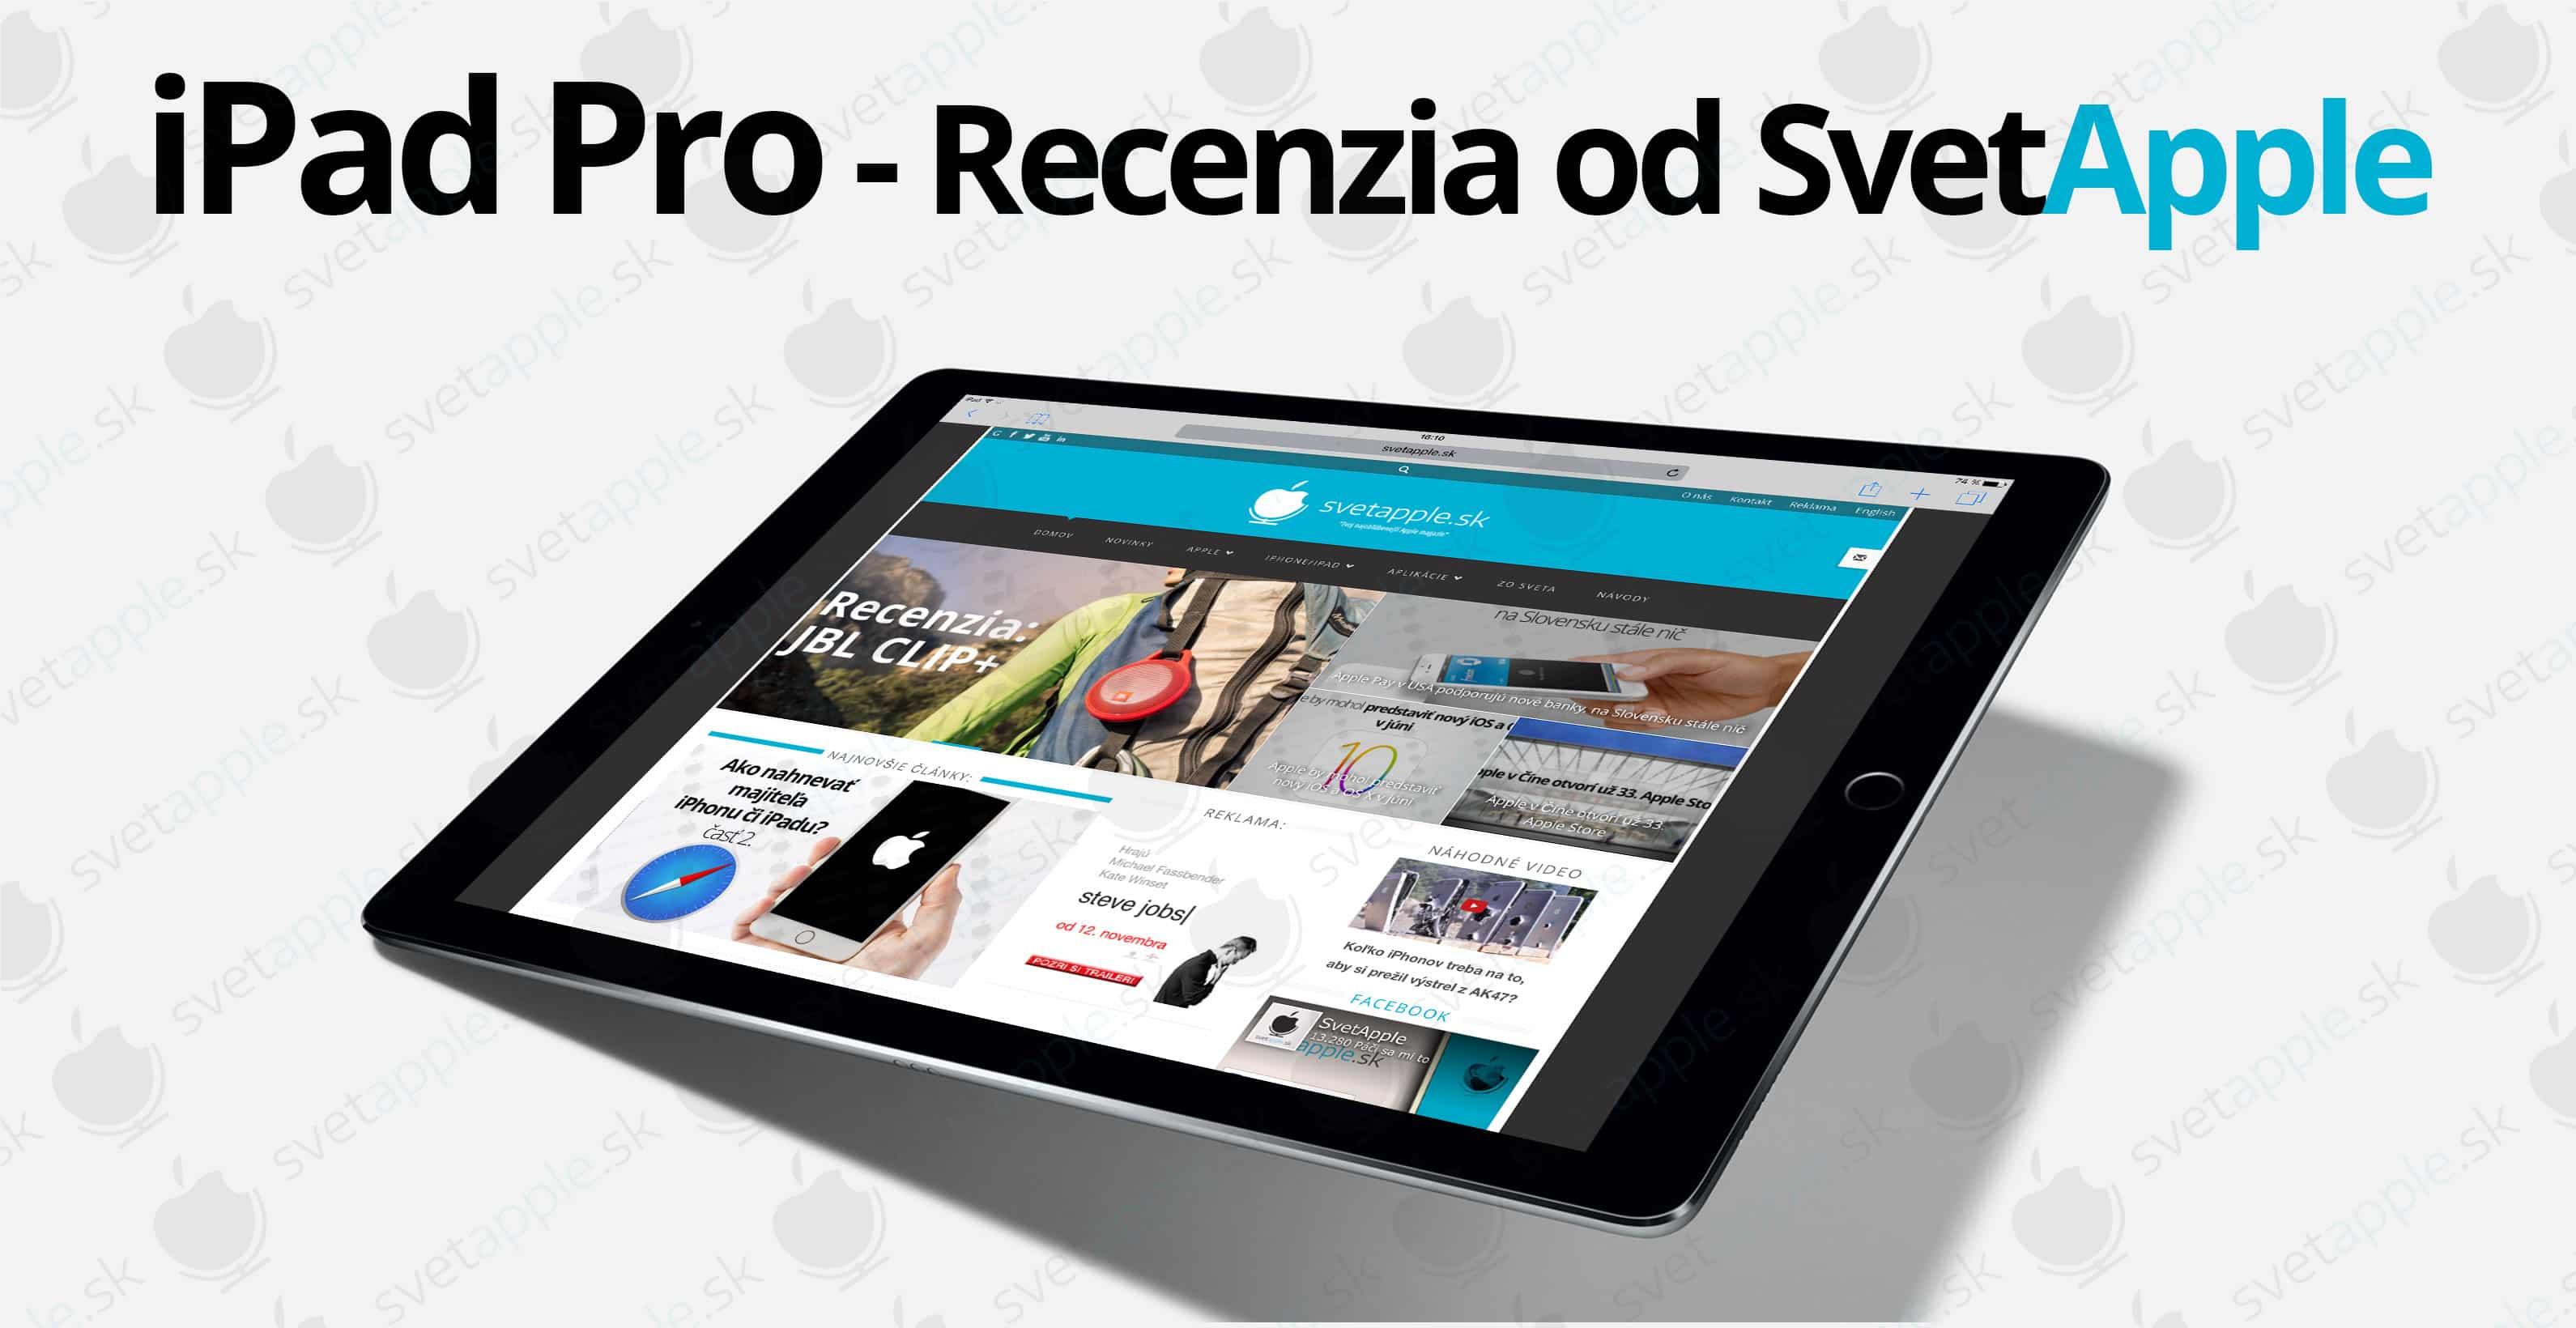 iPad-Pro-Recenzia---titulná-fotografia---SvetApple